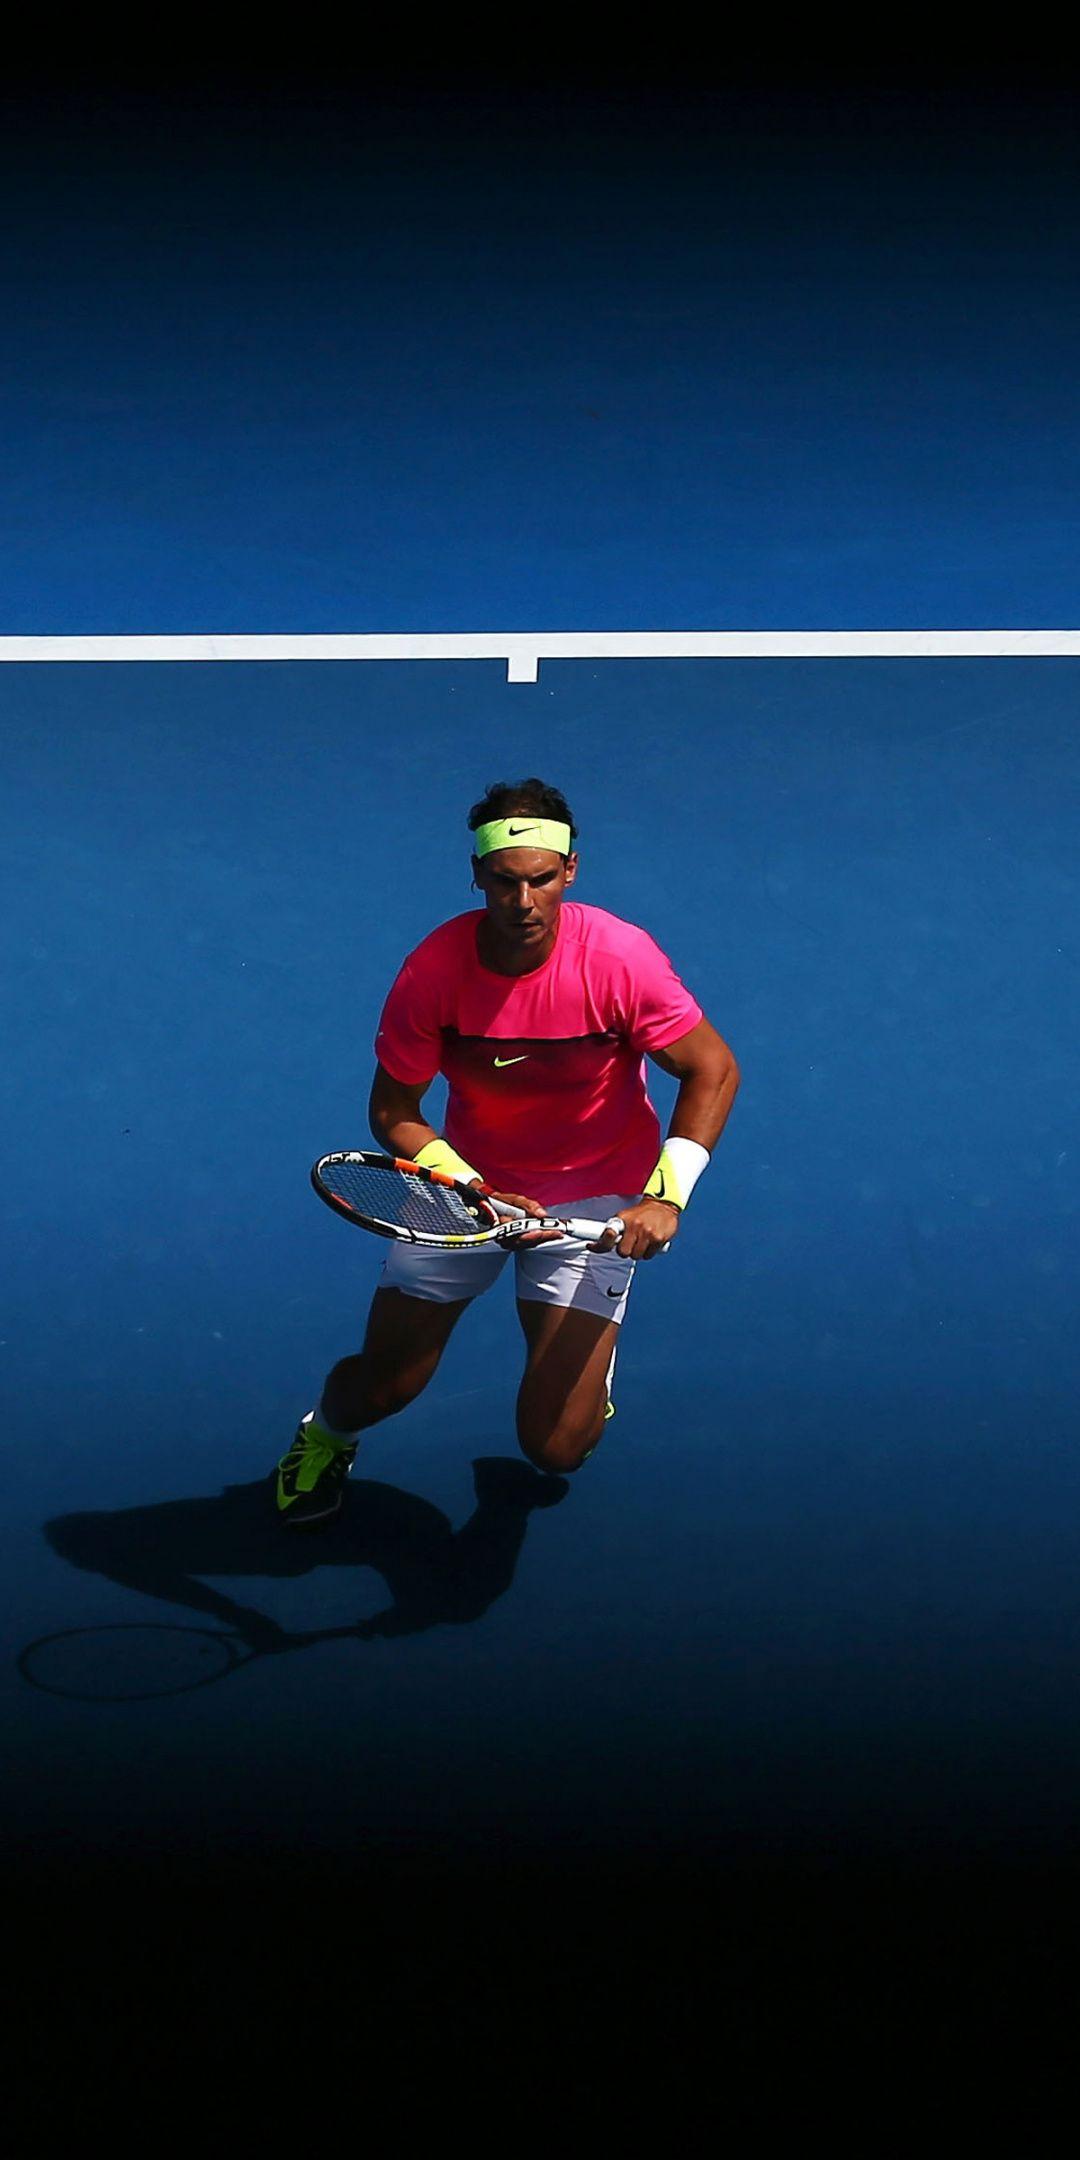 Sports Tennis Player Celebrity Rafael Nadal 1080x2160 Wallpaper Tennis Wallpaper Rafael Nadal Tennis Pictures